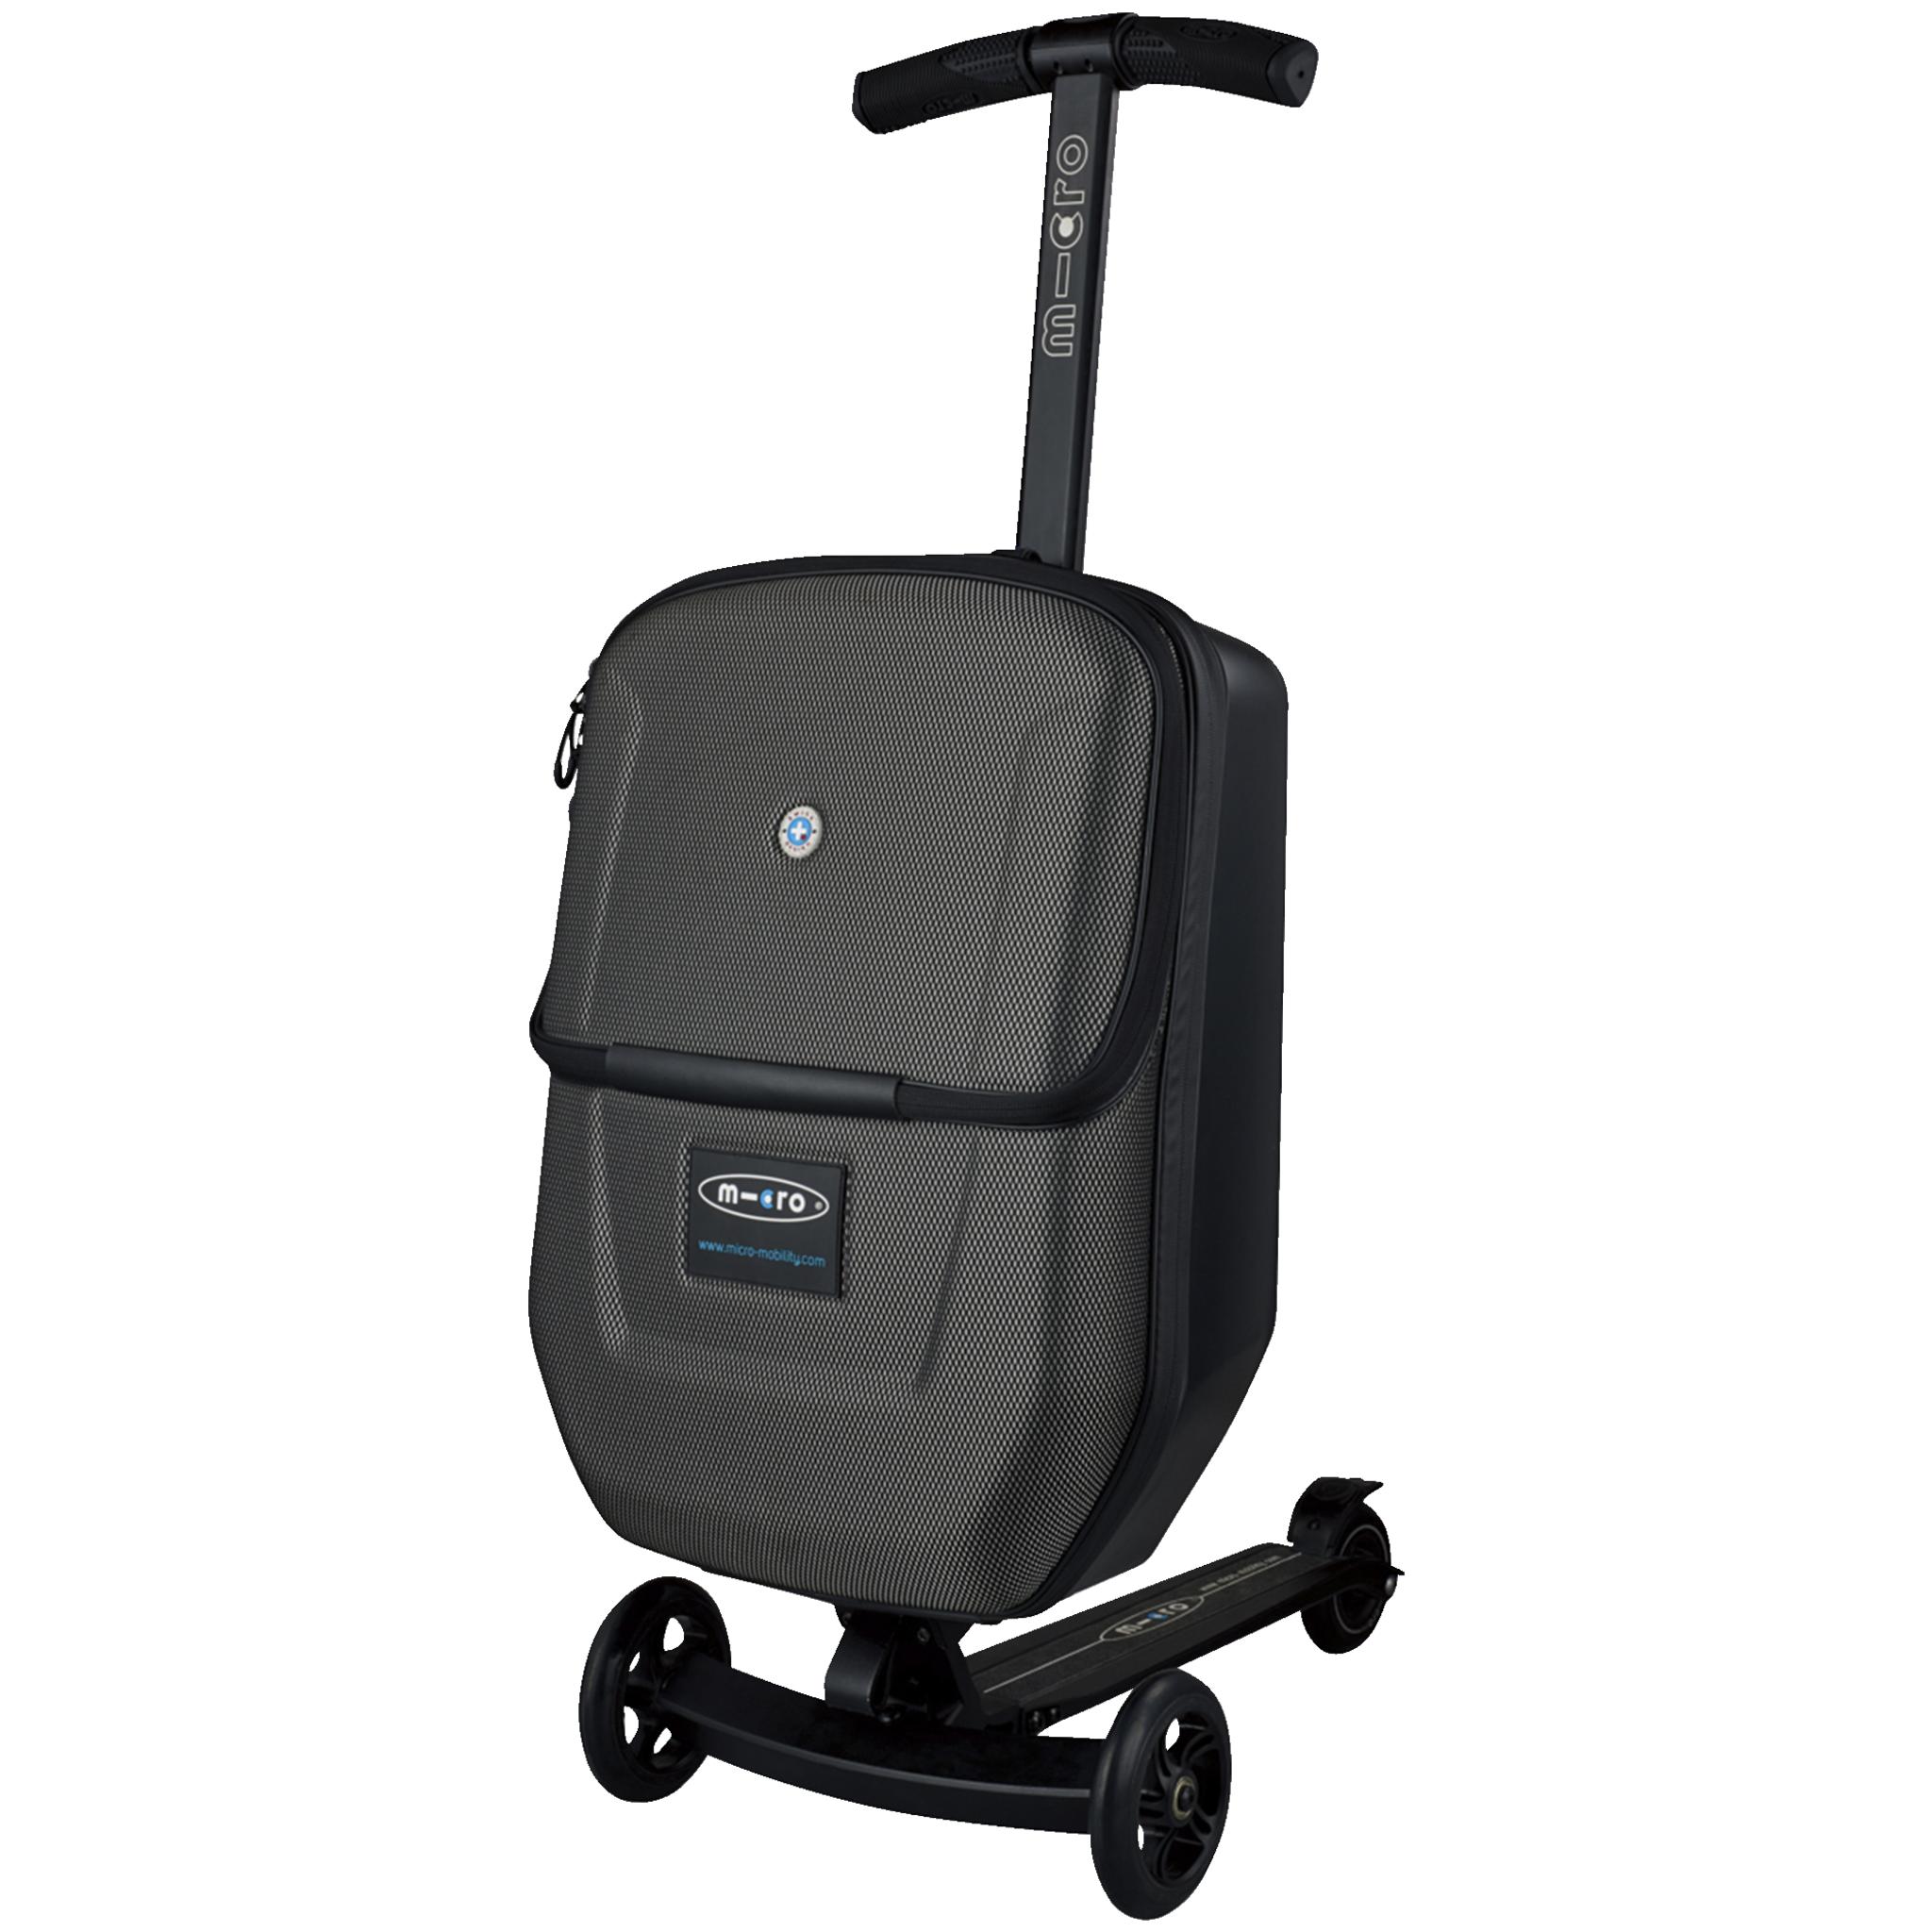 Micro Luggage 3.0, sparkesykkel/reisekoffert